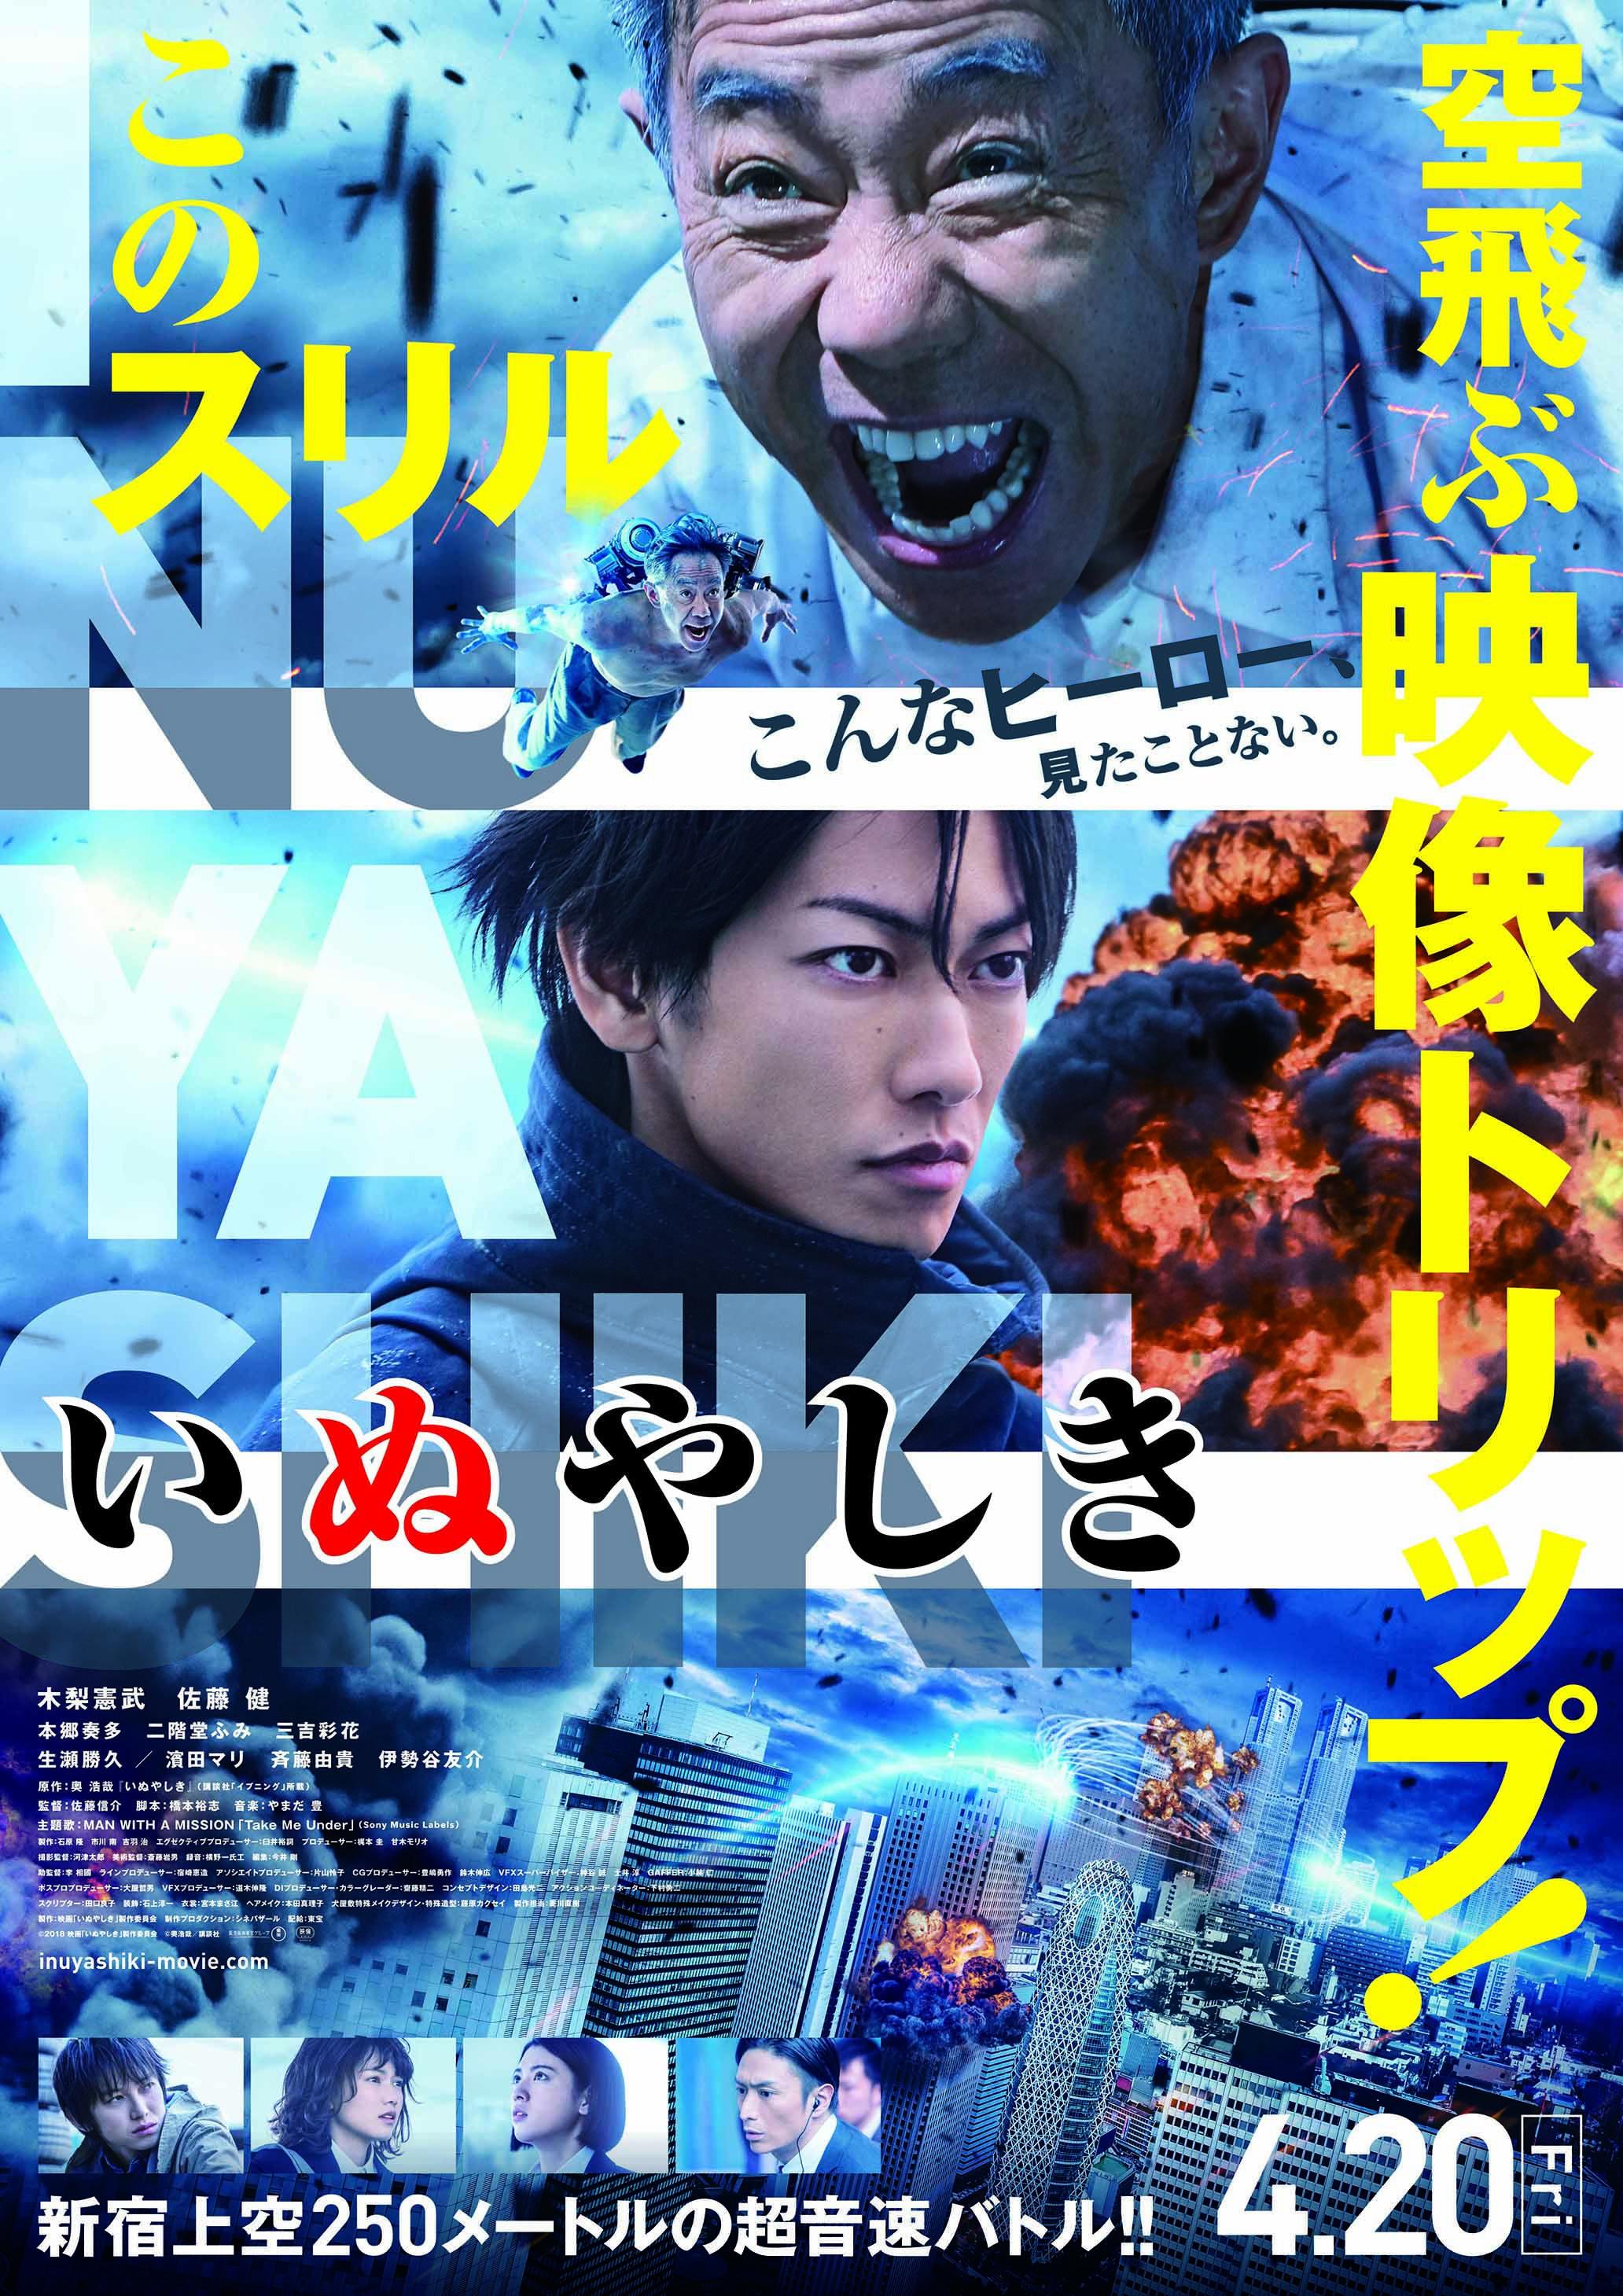 Vfxで日本映画の新時代を切り拓く 映画 いぬやしき 公開初日舞台挨拶レポート いぬやしき 佐藤健 映画 ポスター